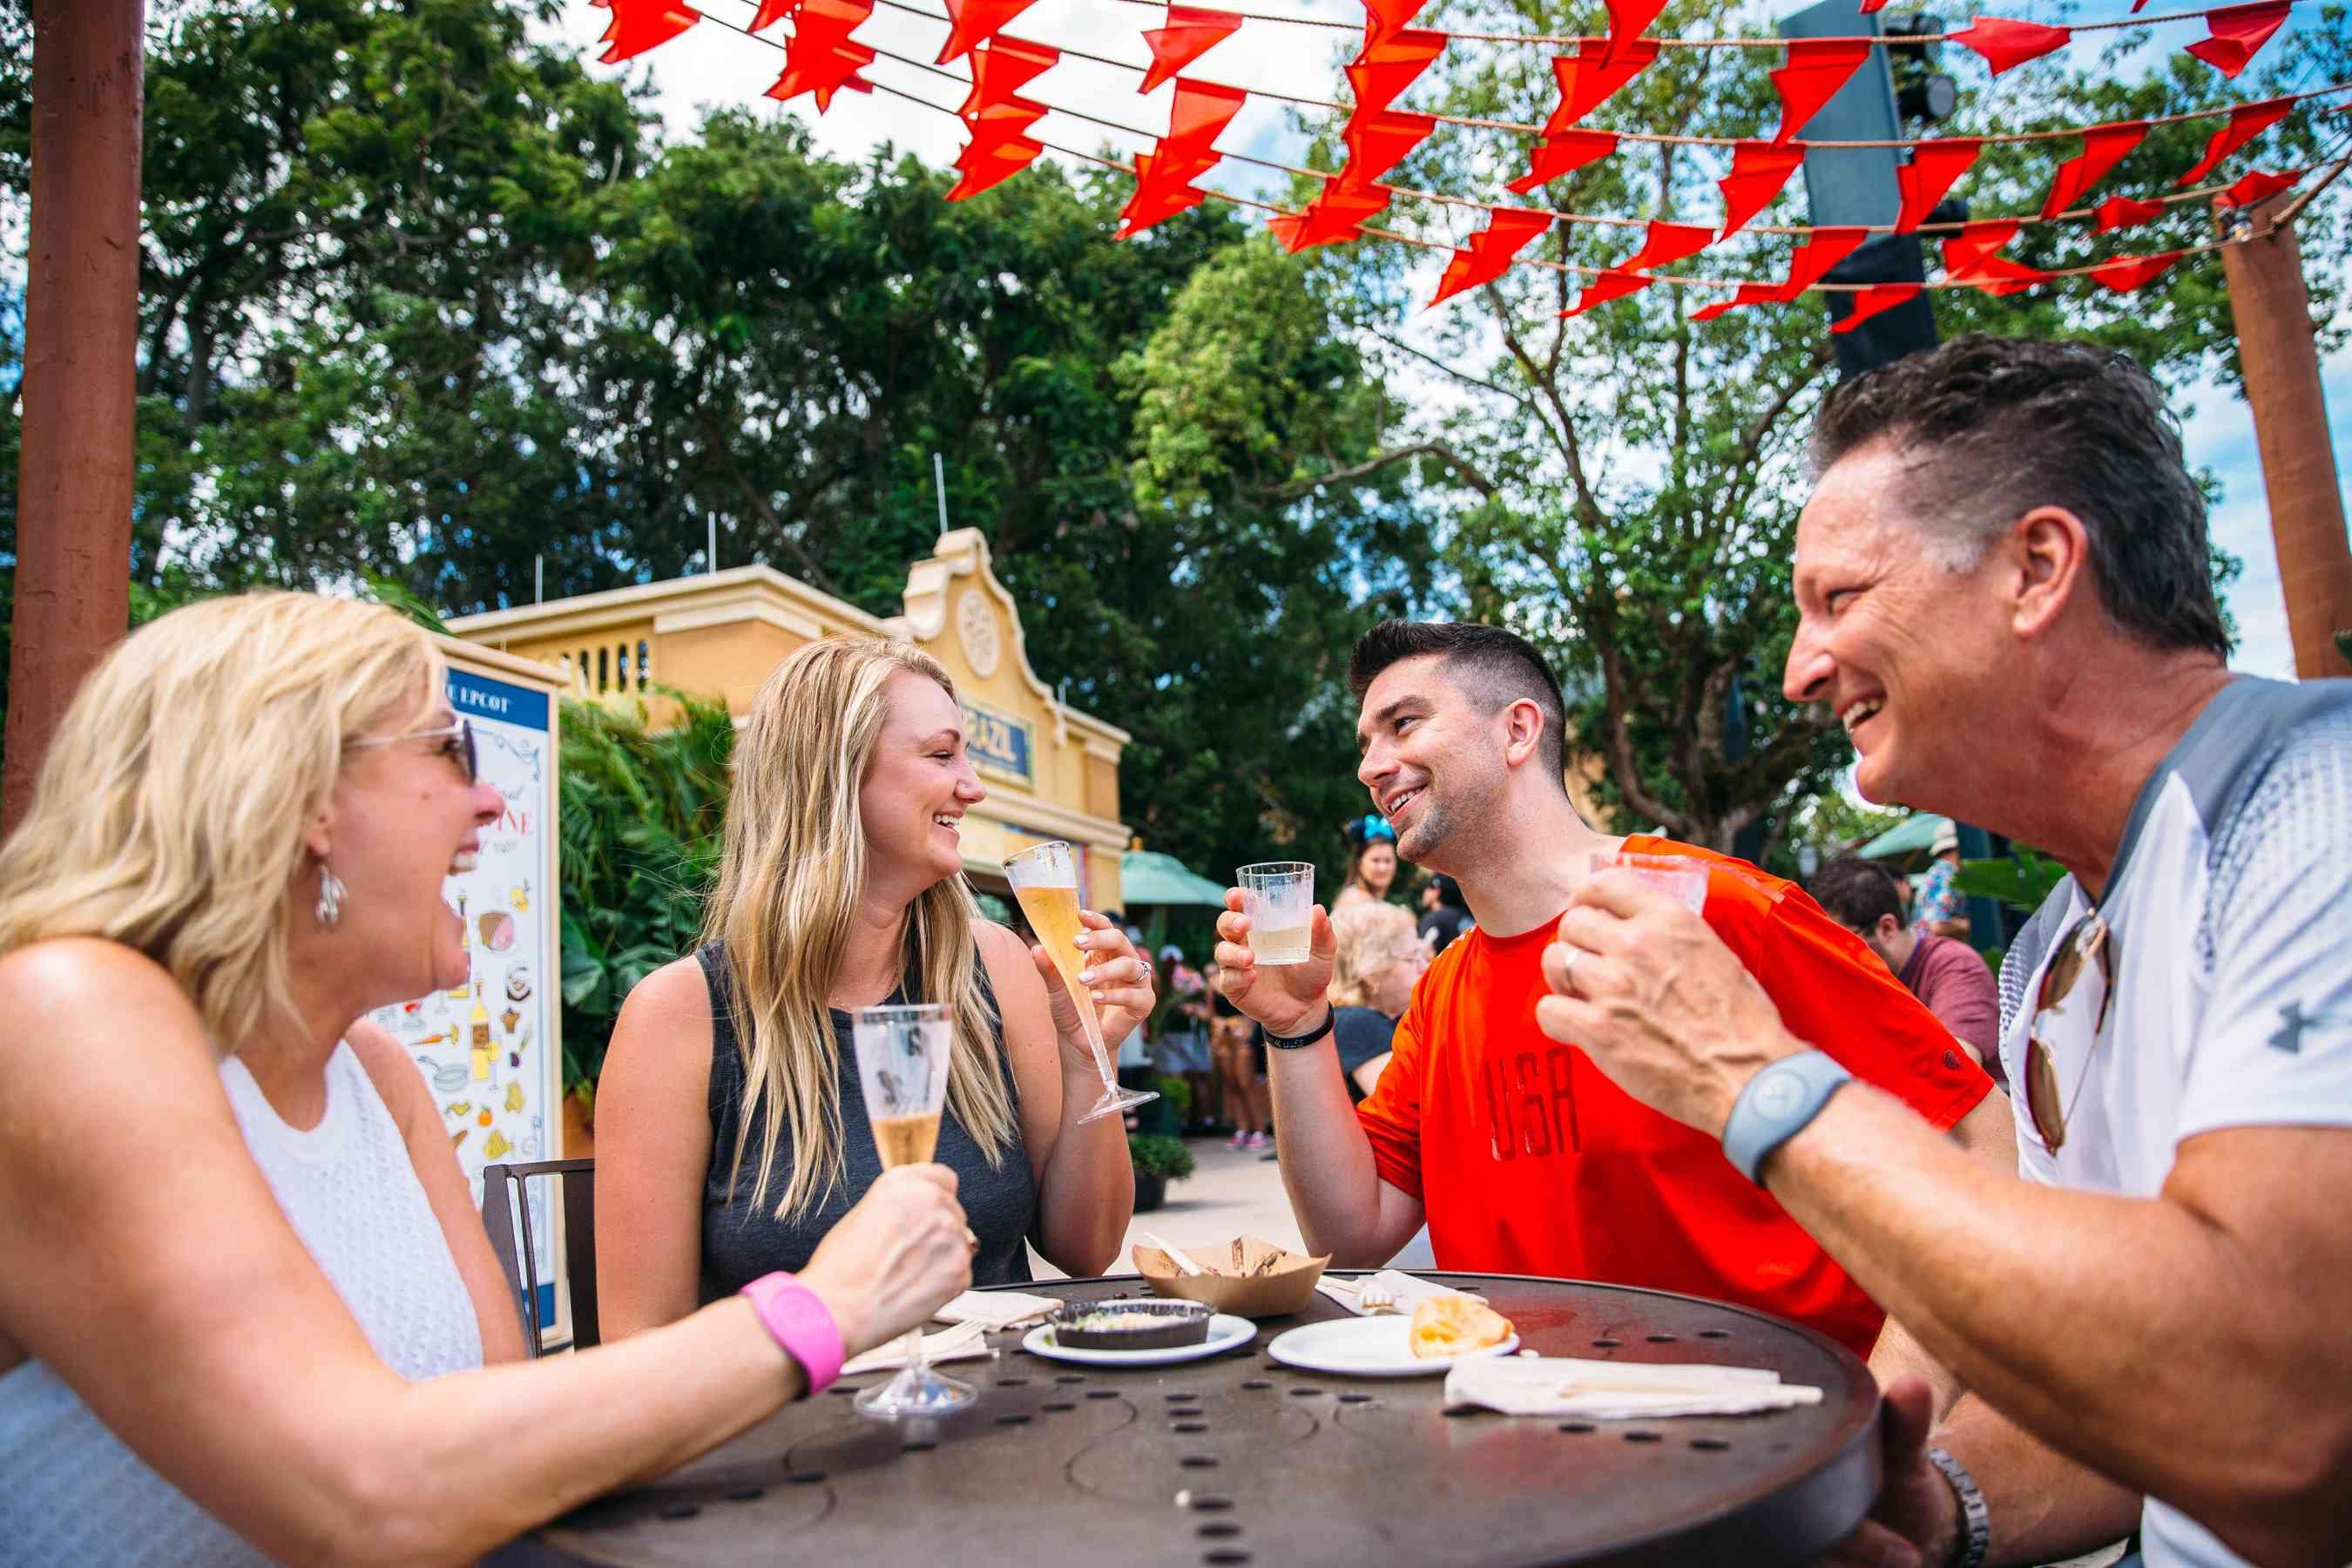 Epcot's Food & Wine Festival marketplaces